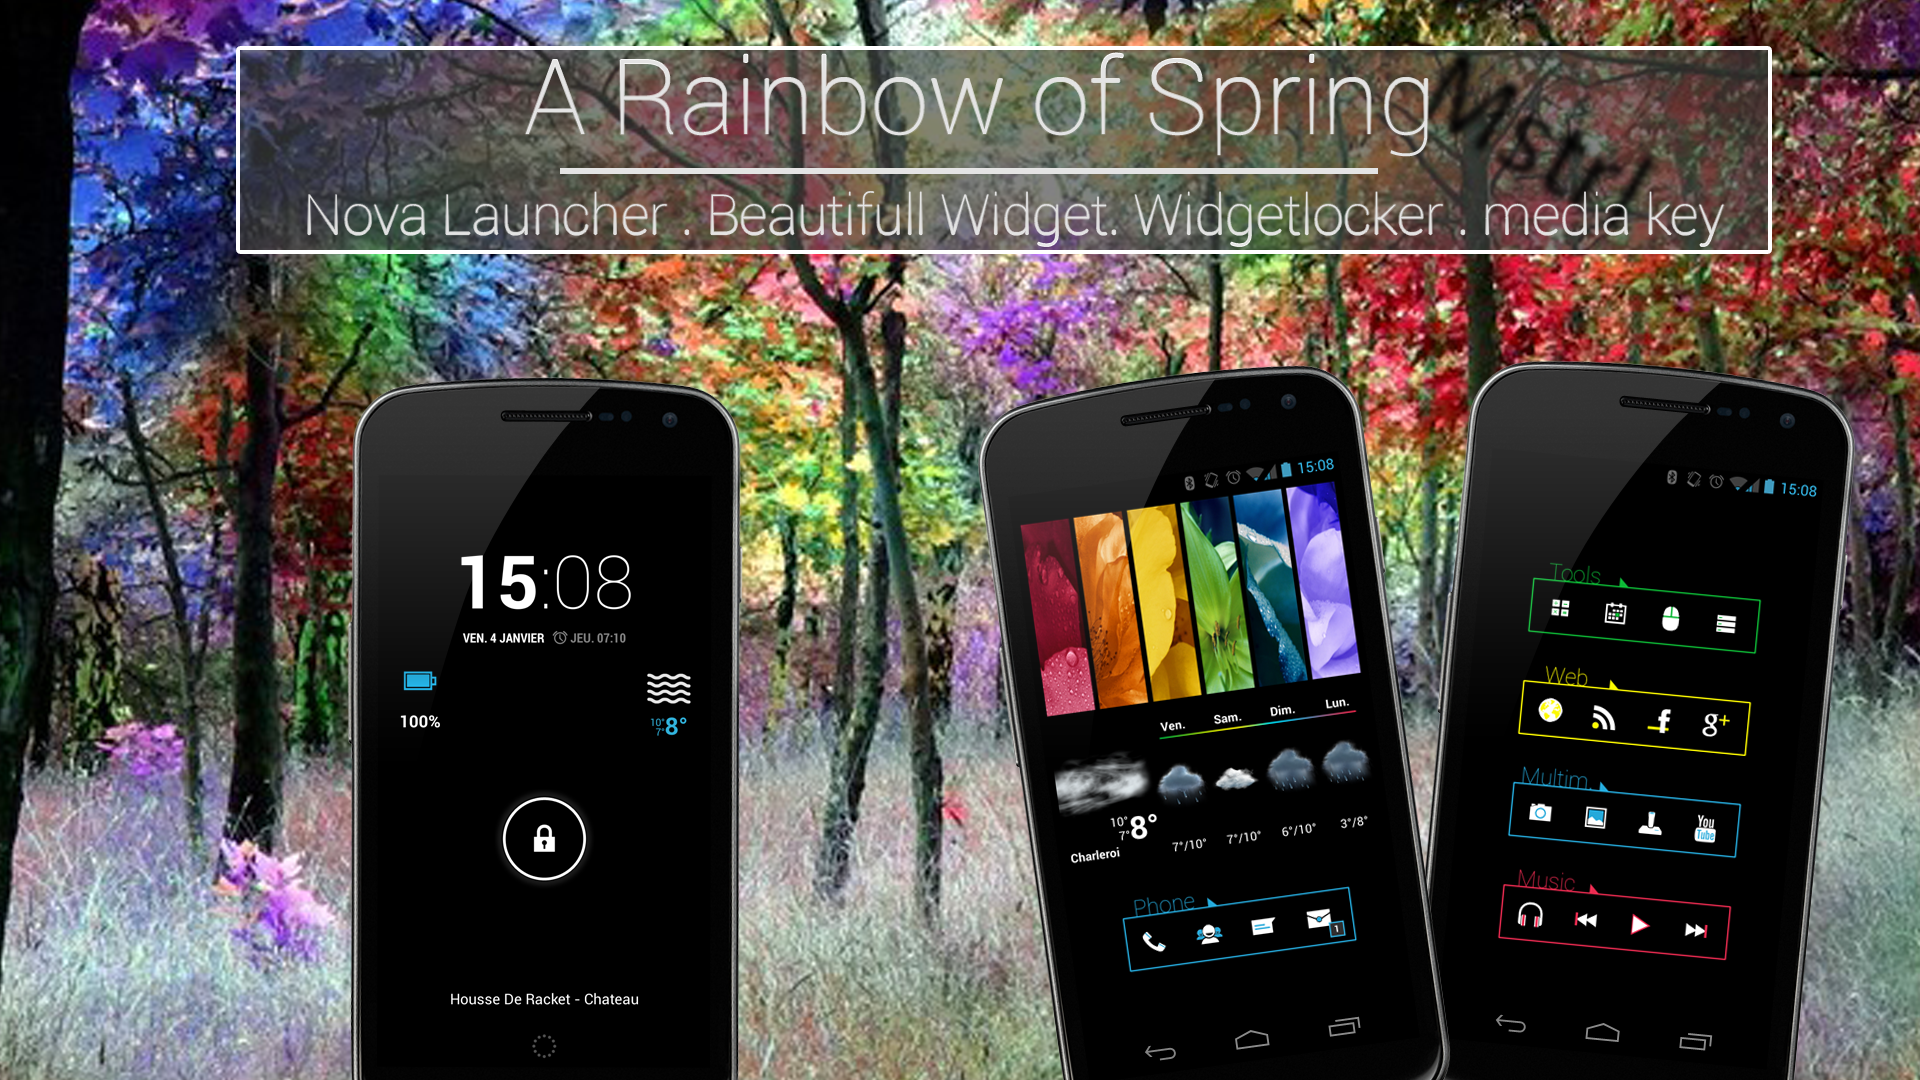 a_rainbow_of_spring_by_mstrl-d5qdu8w.png